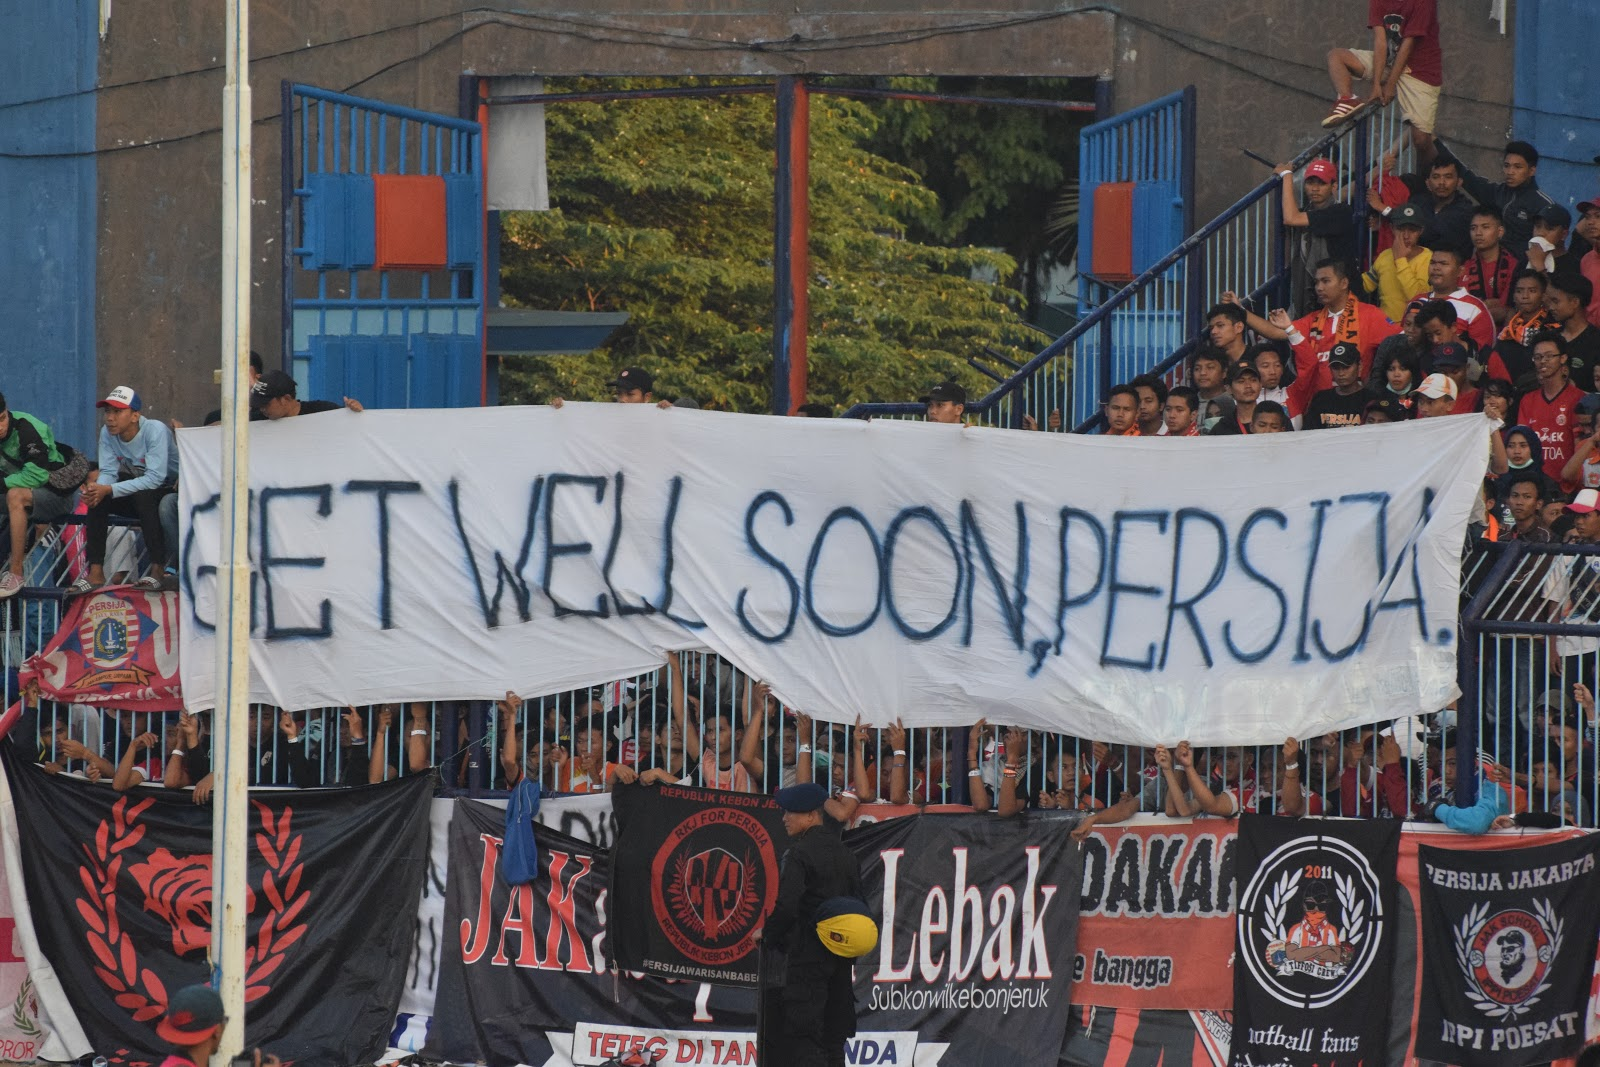 Jakarta Casual: Persija Loss Piles Pressure On Coach Teco